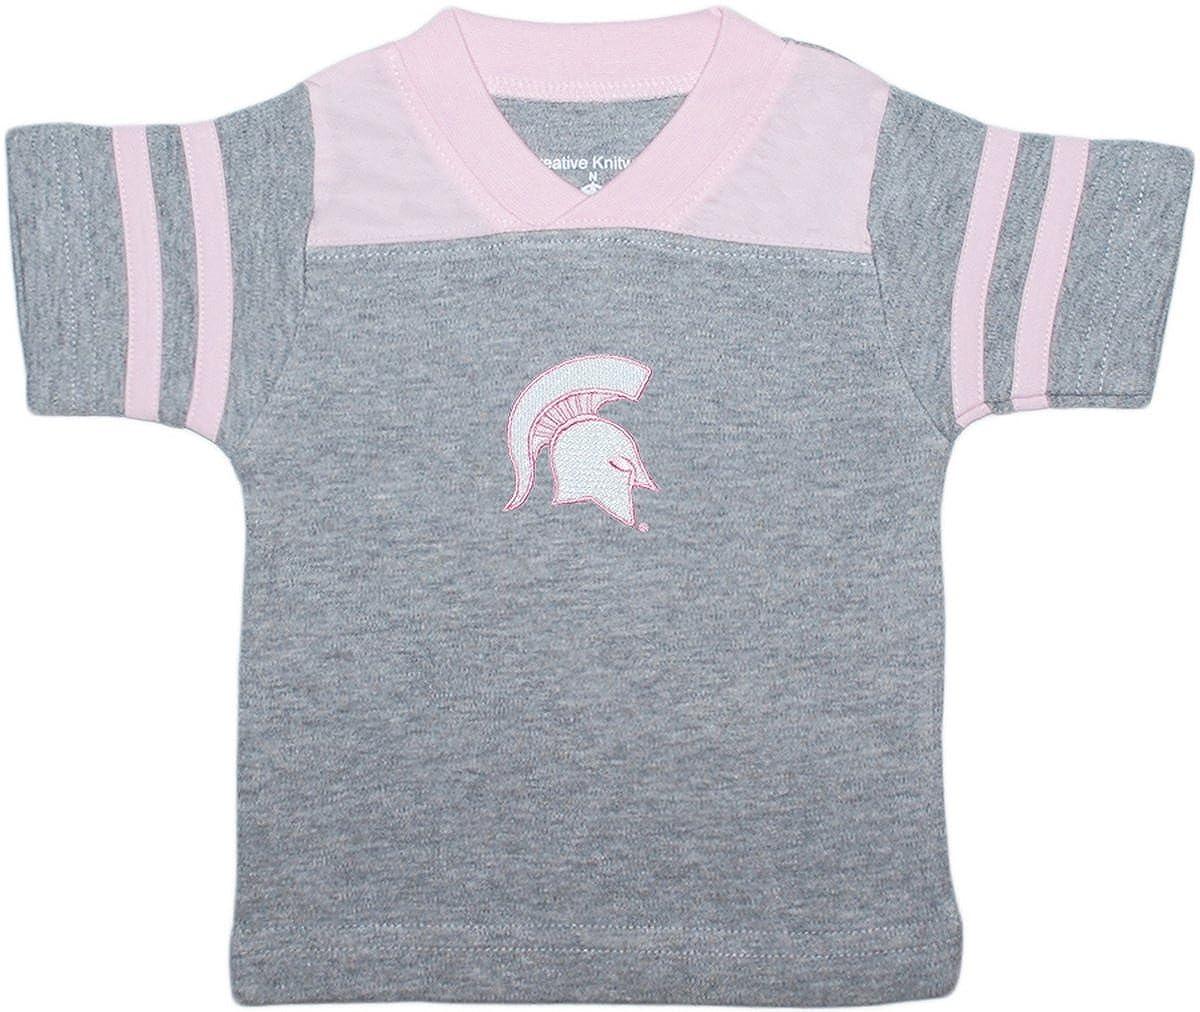 Michigan State University Spartans Baby Sport Shirt